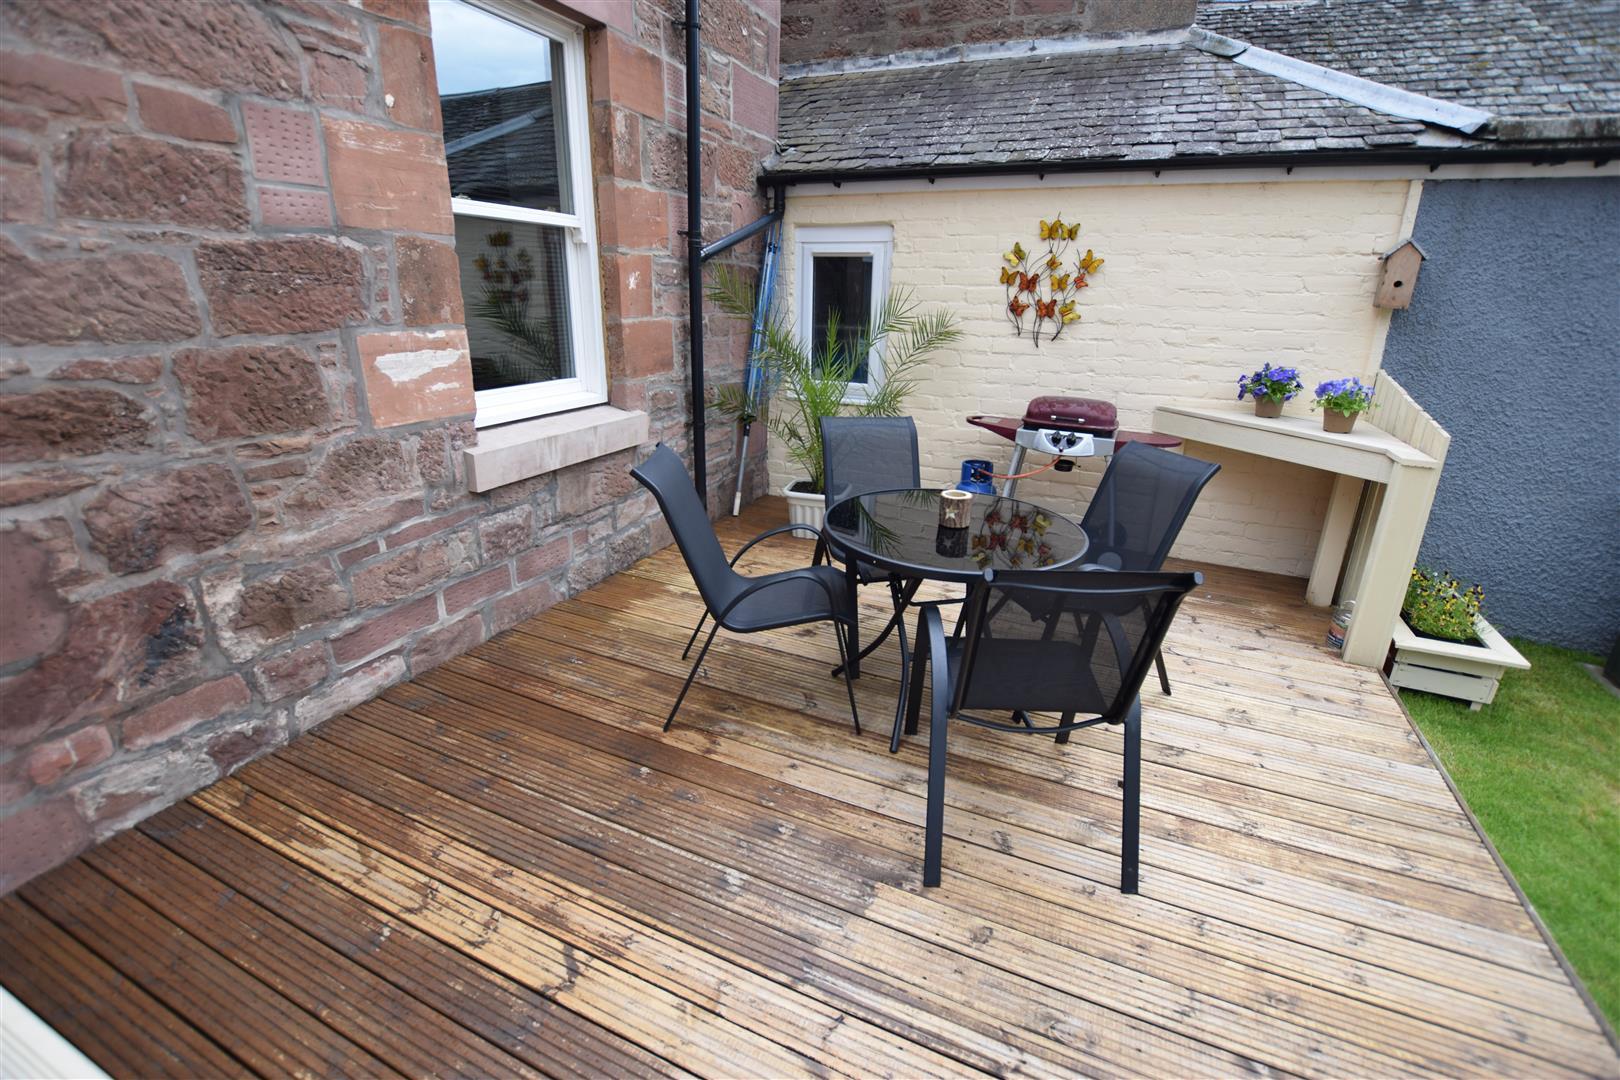 1 Auction House, Airlie Street, Alyth, Blairgowrie, Perthshire, PH11 8AJ, UK